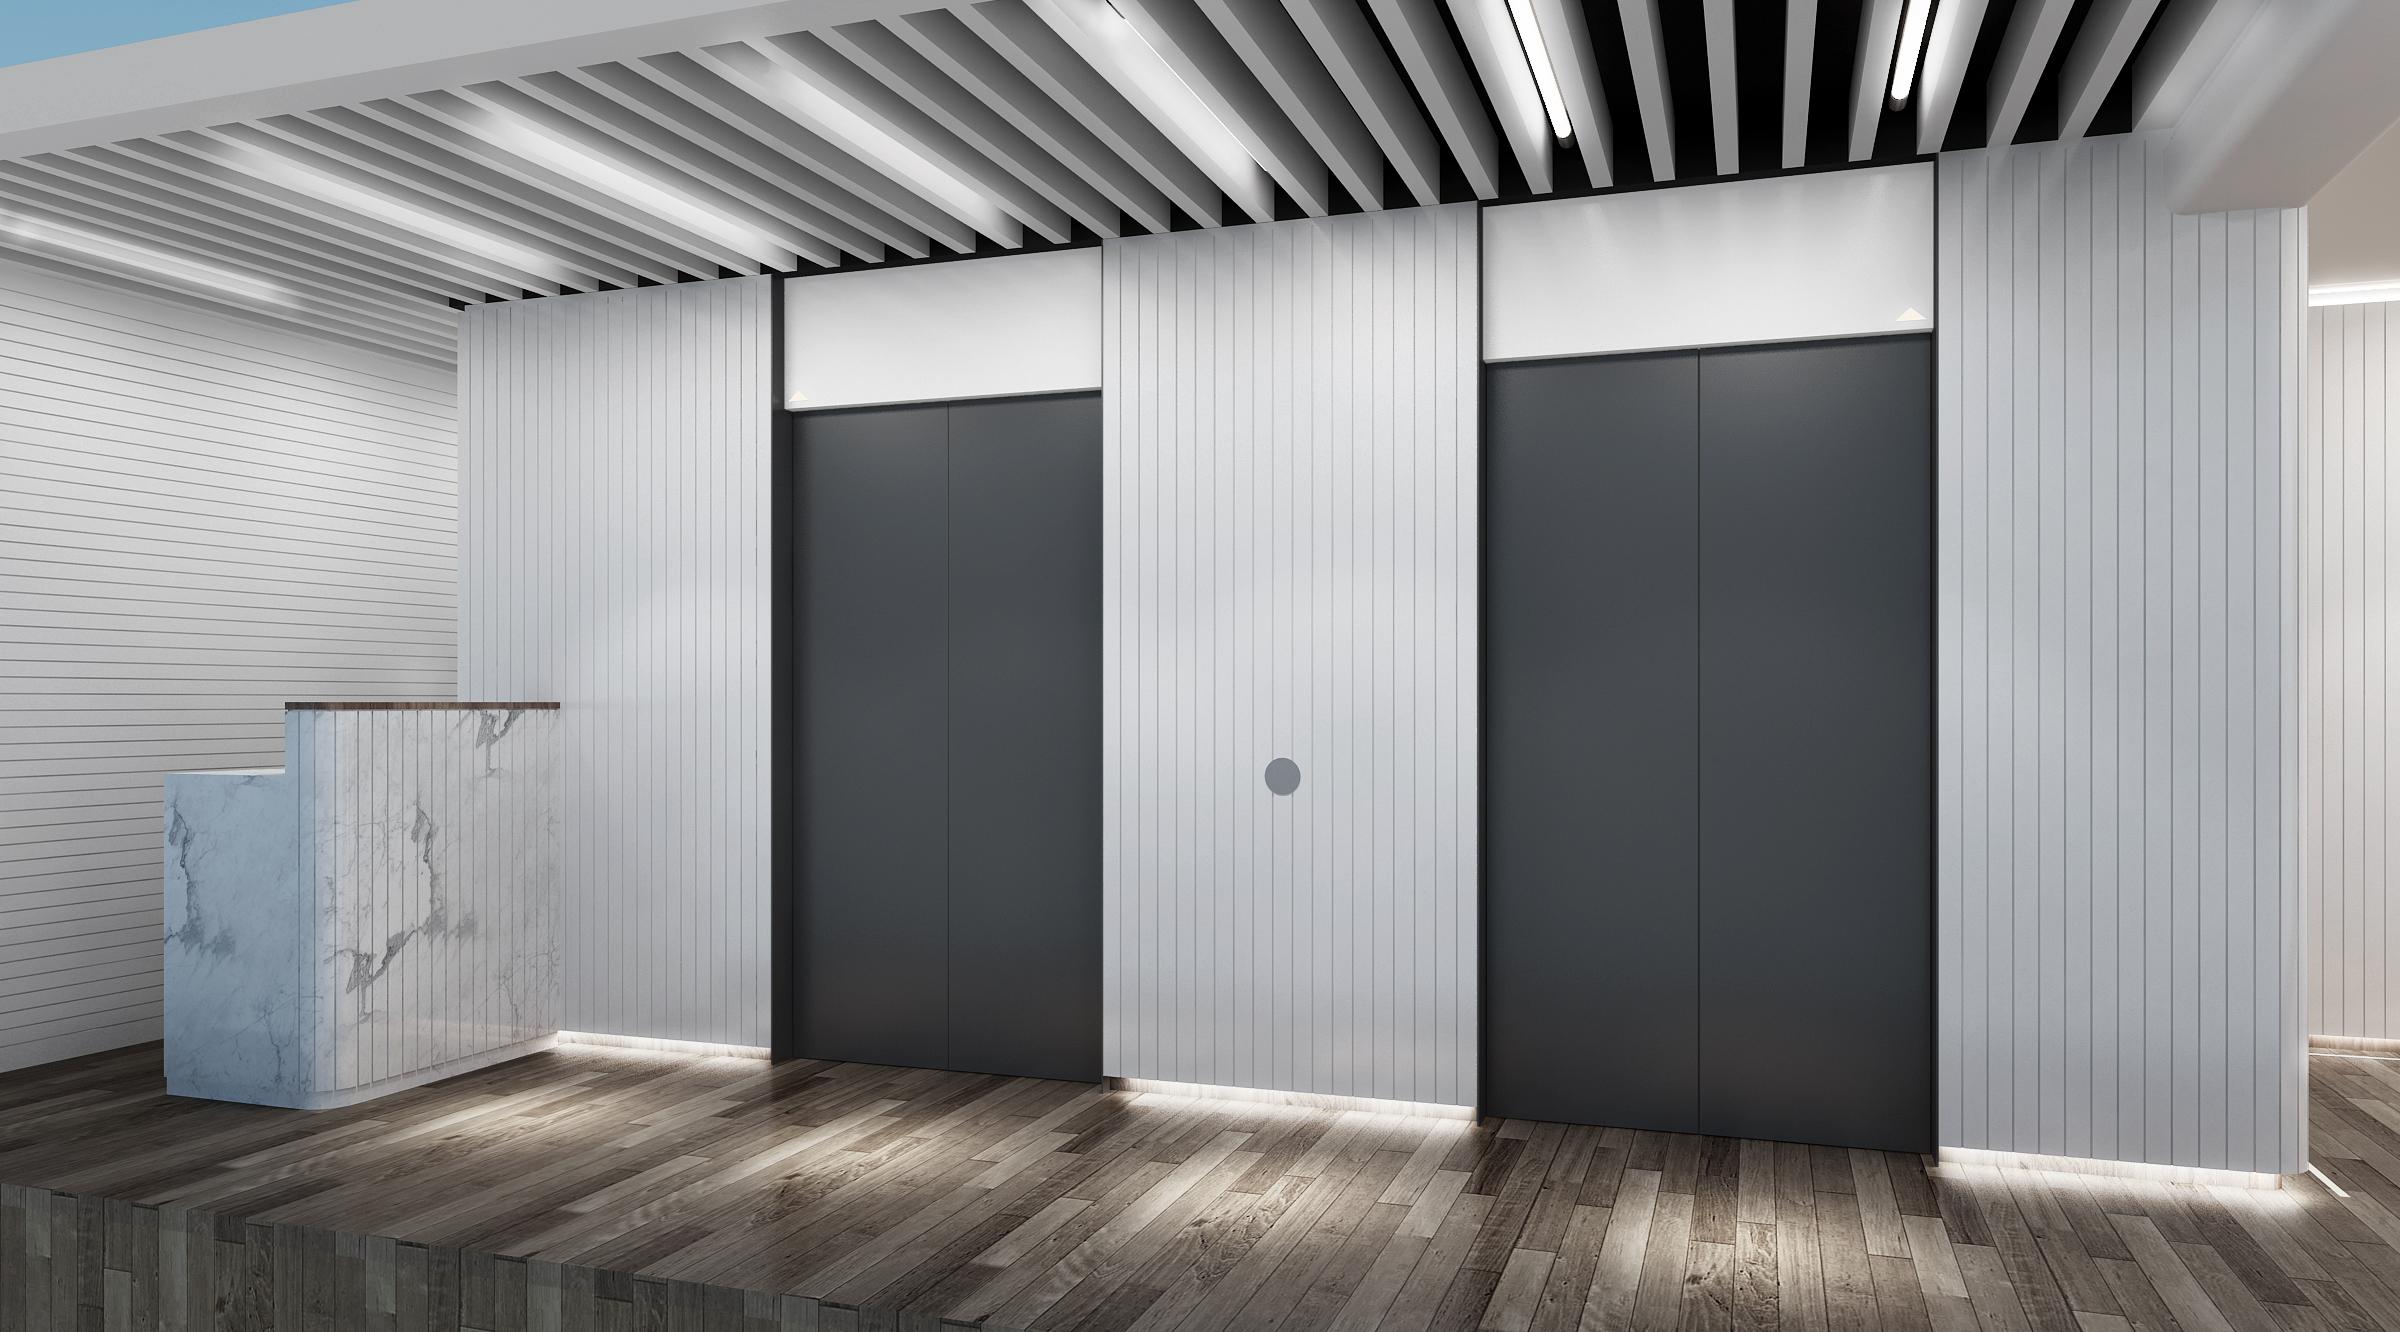 ARTTA Concept Studio